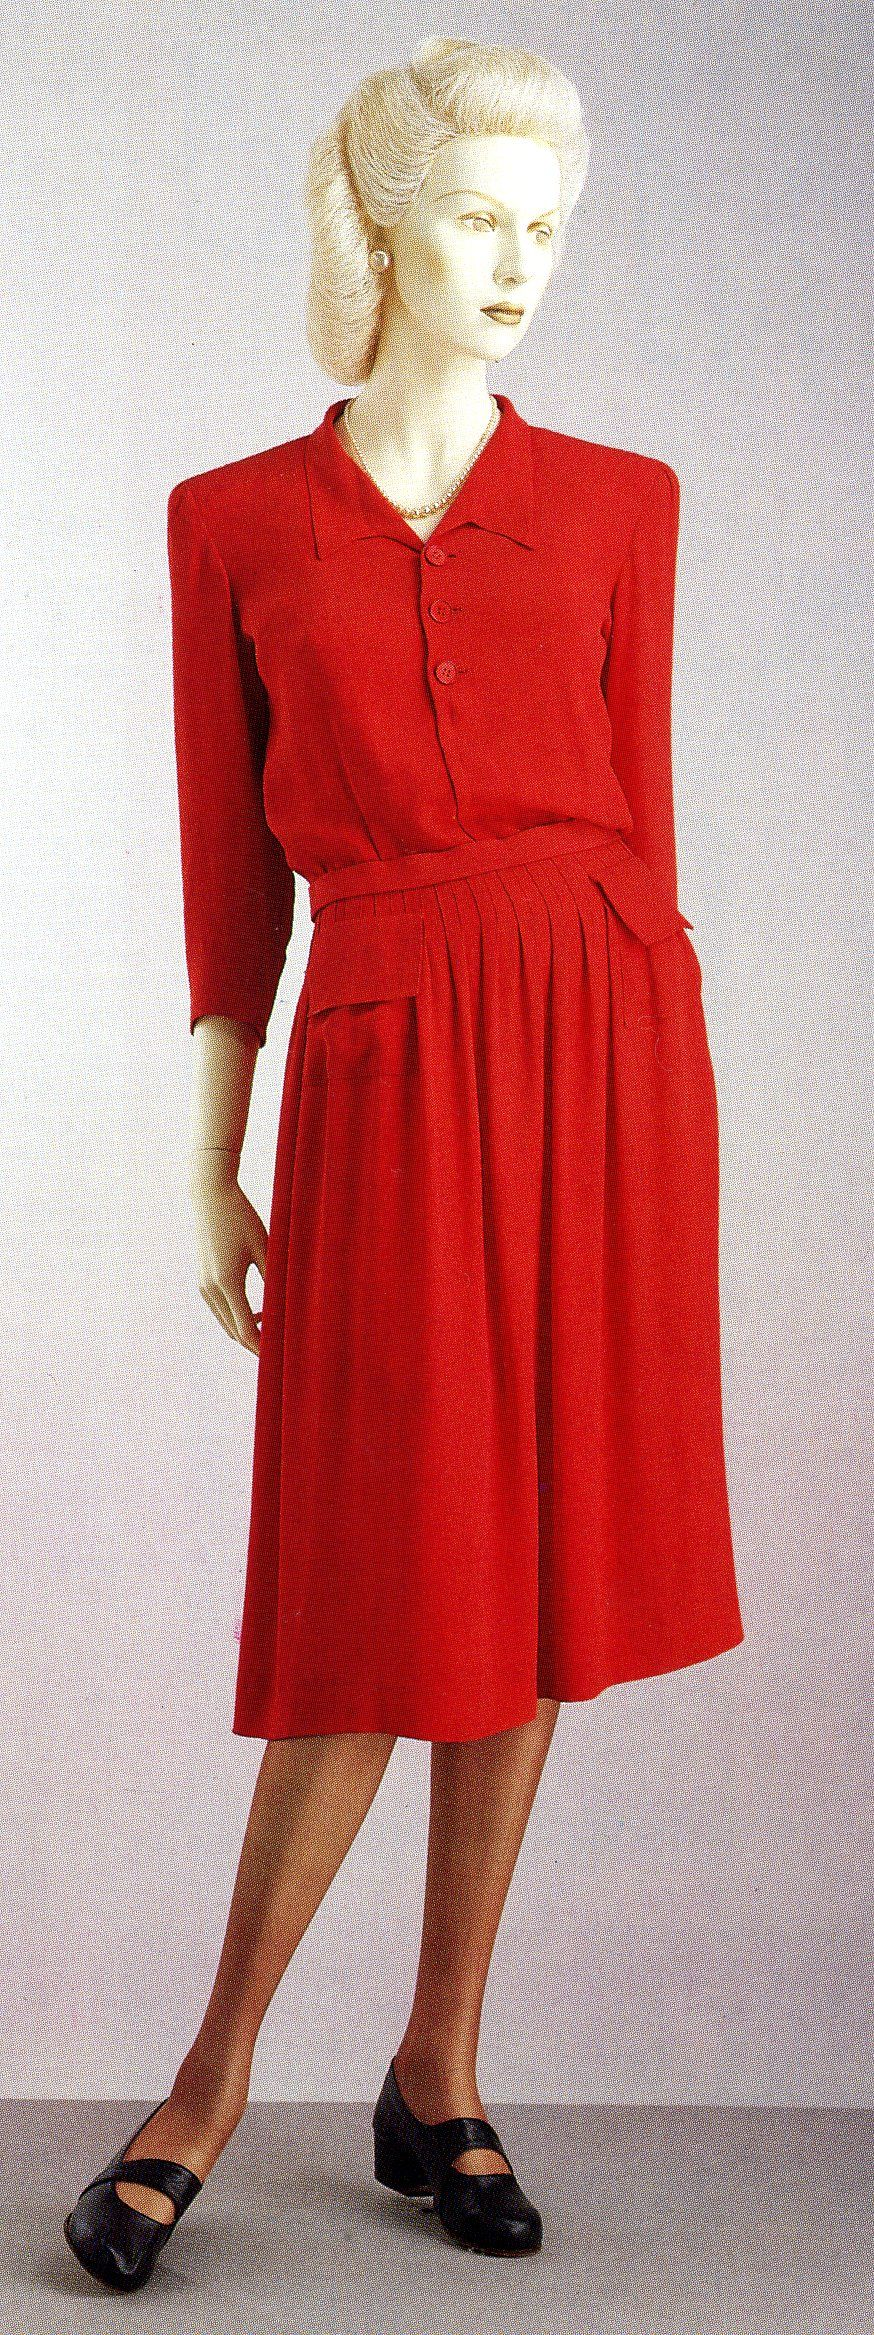 1940s dresses cheap uk clothing